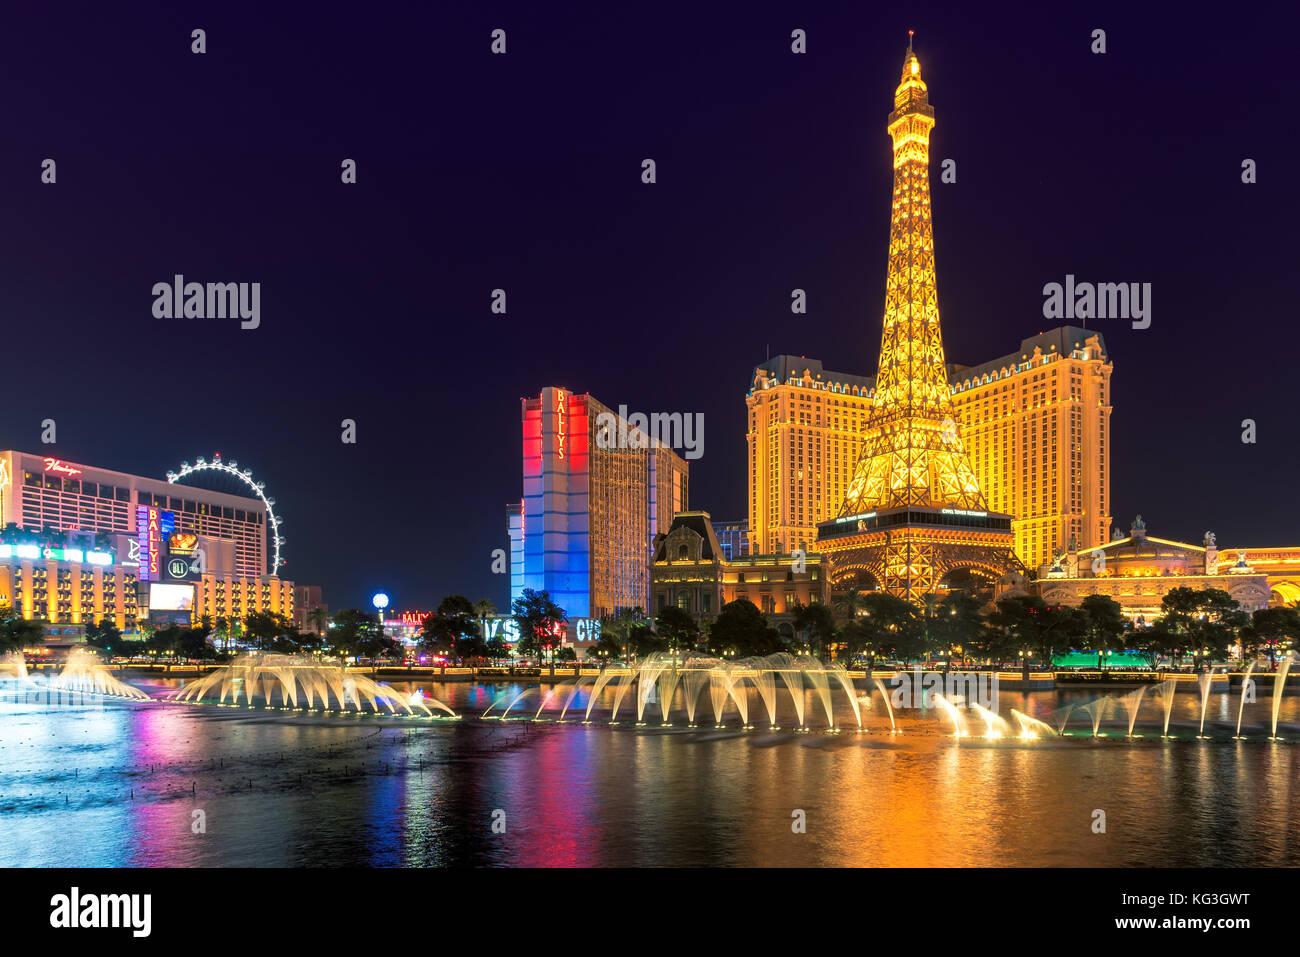 Las Vegas Strip at night - Stock Image